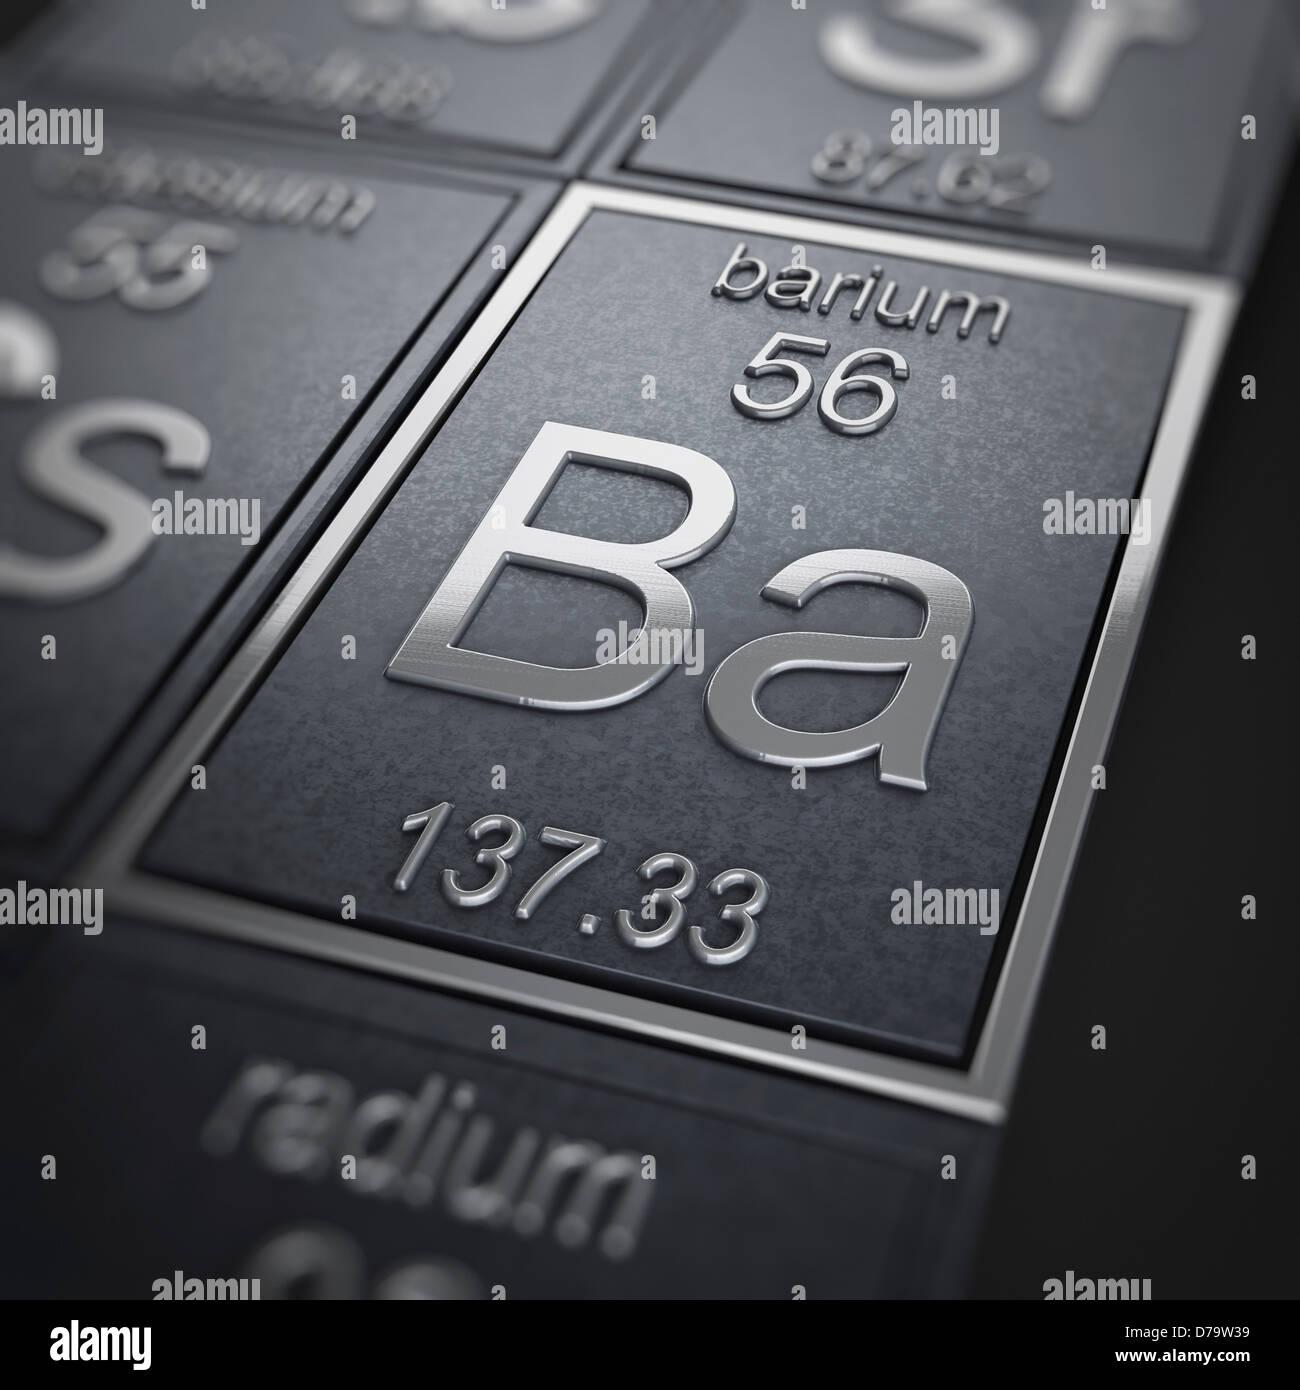 Barium chemical element stock photo 56150957 alamy barium chemical element biocorpaavc Images